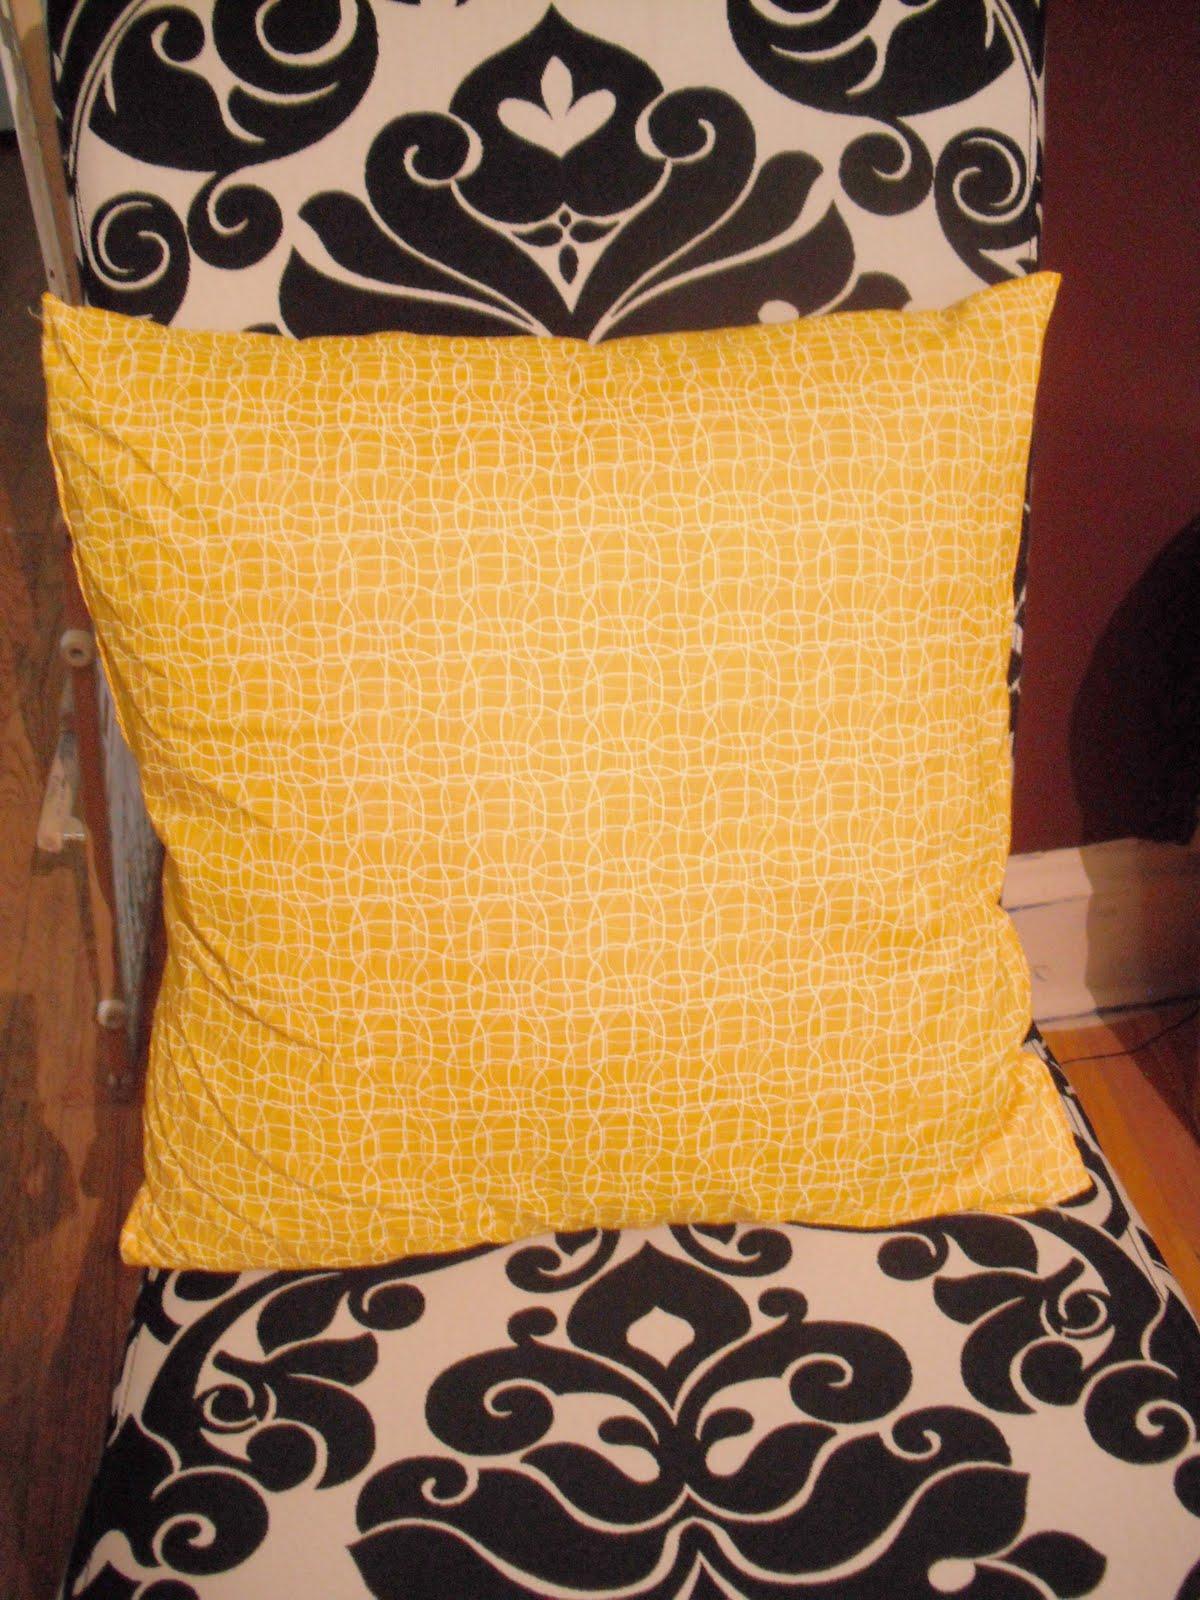 Ginny S Art Rosette Pillow Tutorial